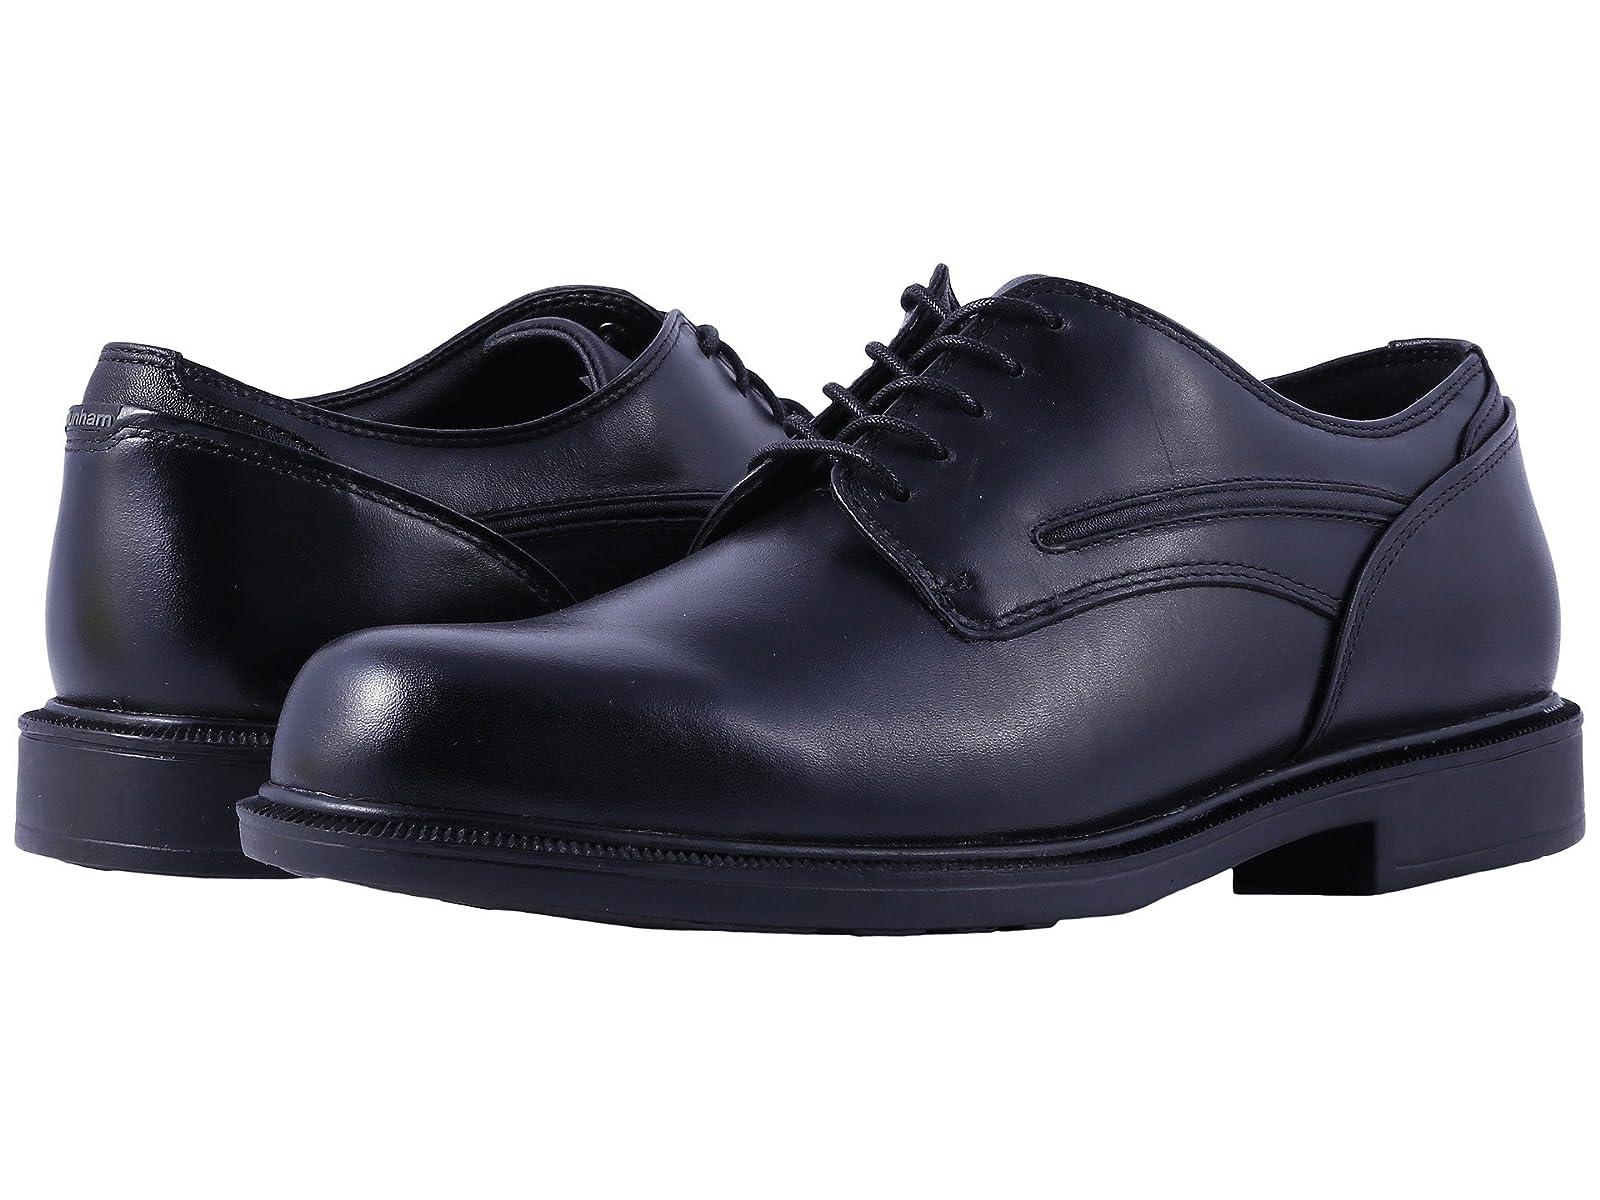 Dunham Burlington WaterproofAtmospheric grades have affordable shoes